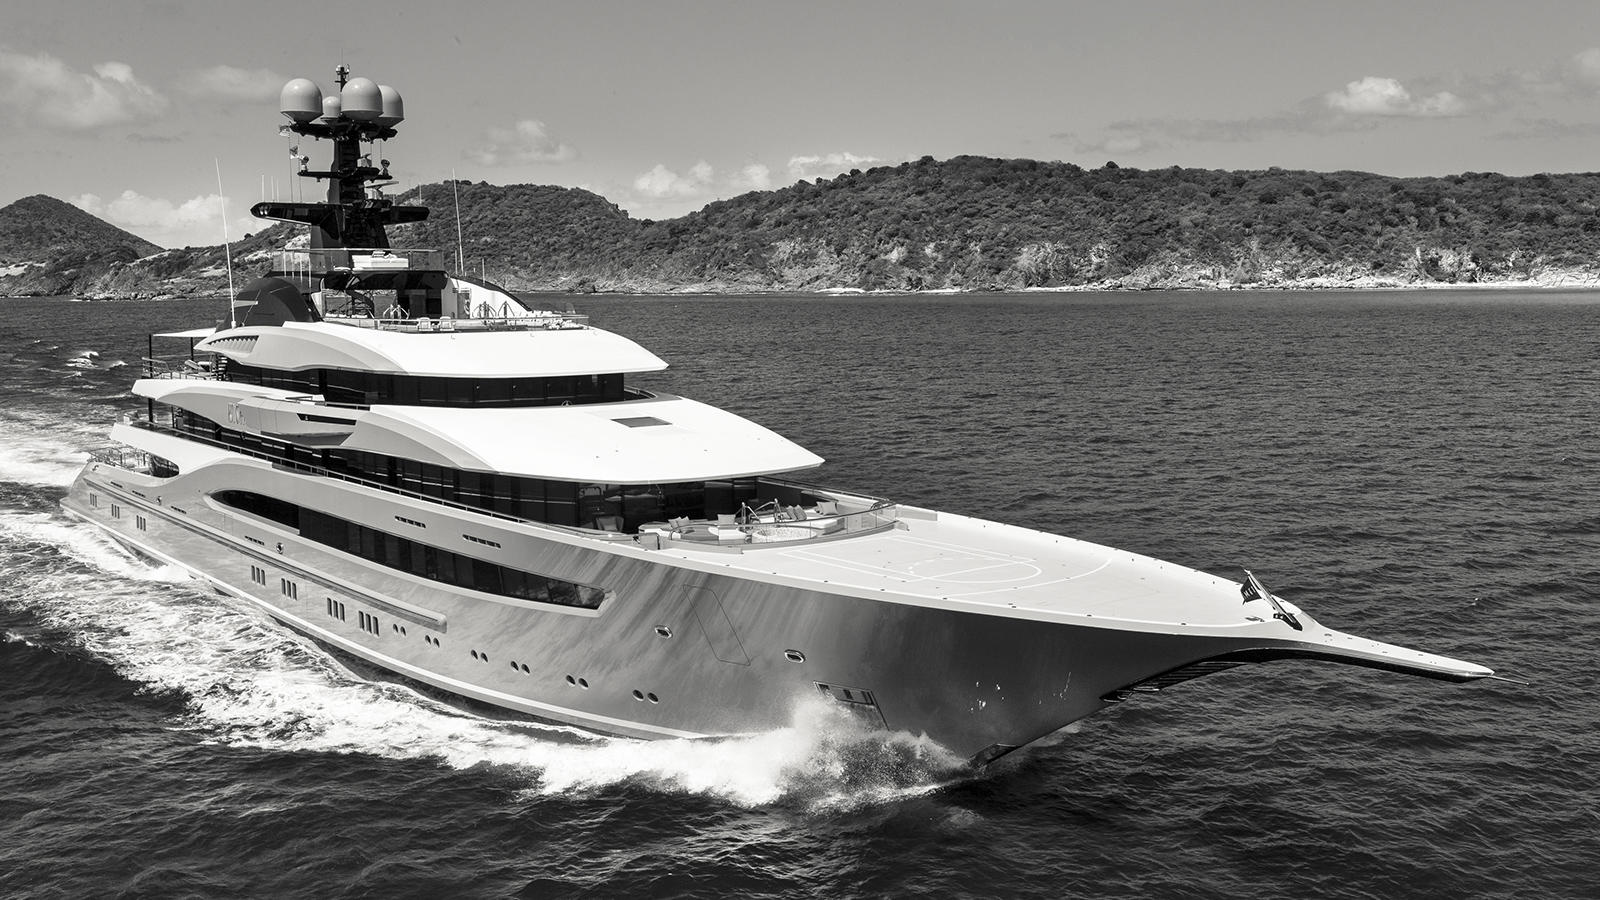 nXipwHpjSgGwf75baQxH_Kismet-super-yacht-lurssen-shahid-khan-95-metres-credit-guillaume-plisson-runni